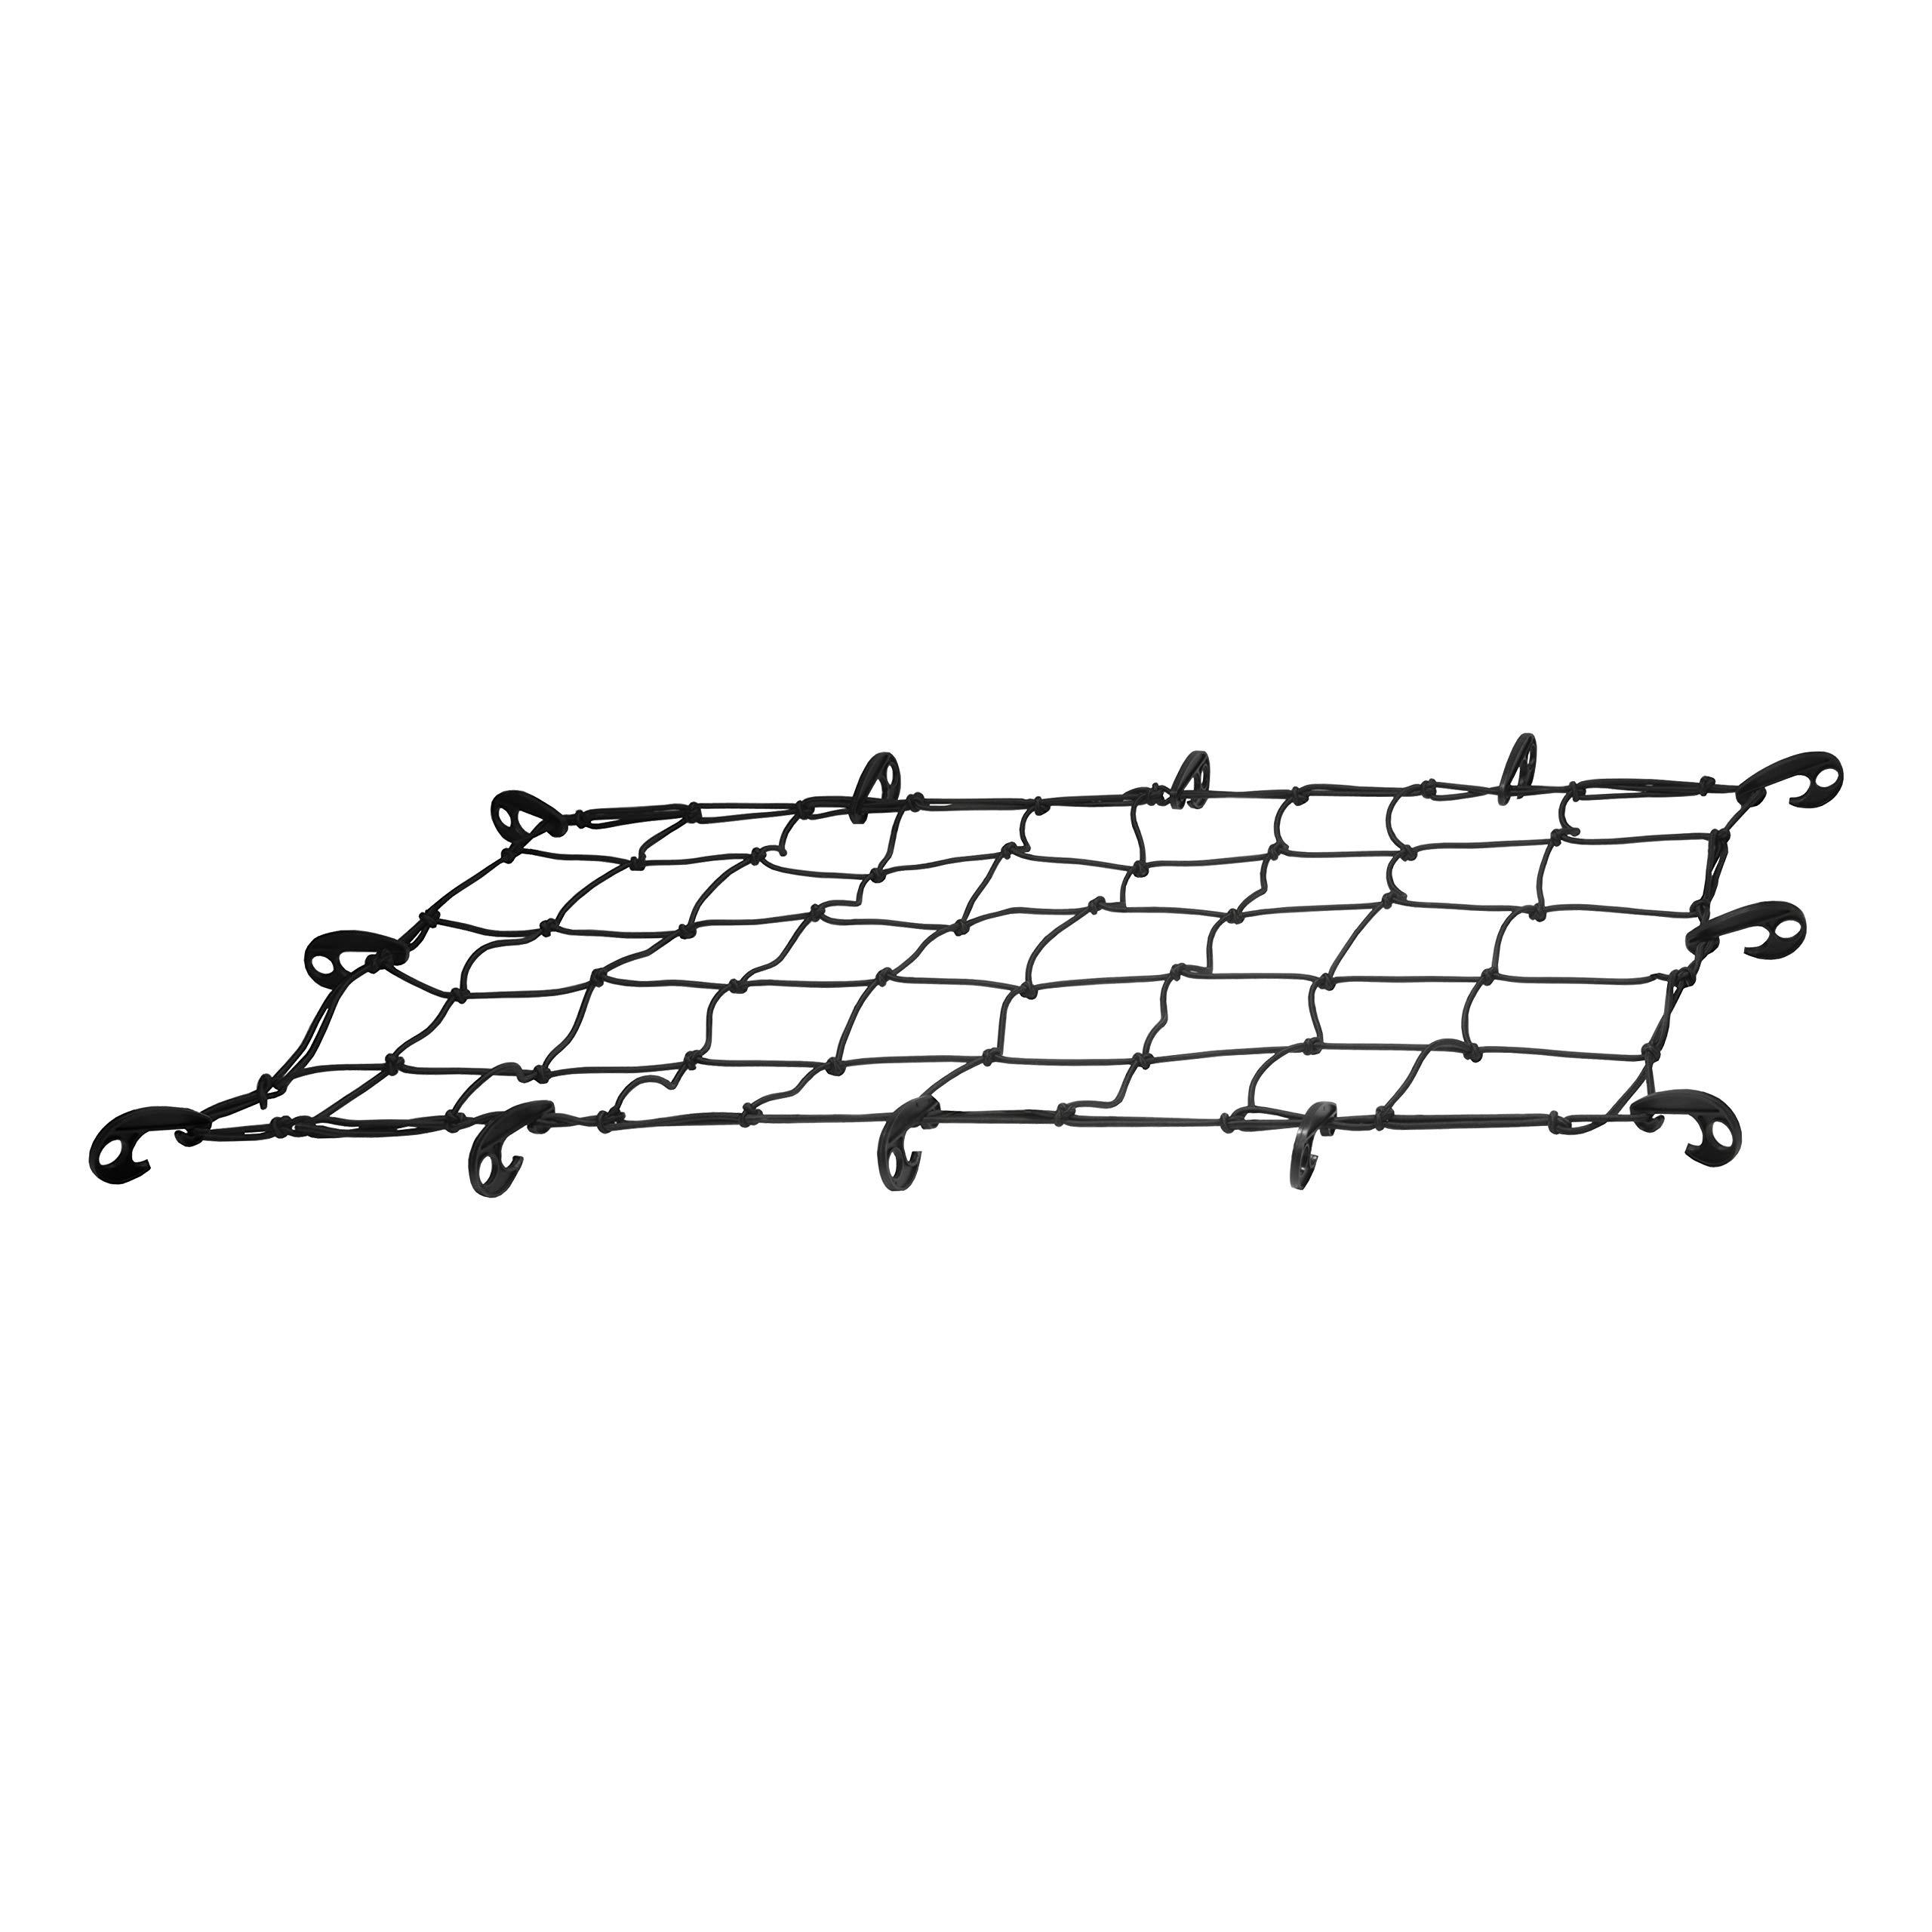 CURT 18202 Elastic Cargo Net with Hooks, 43-Inch x 24-Inch by CURT